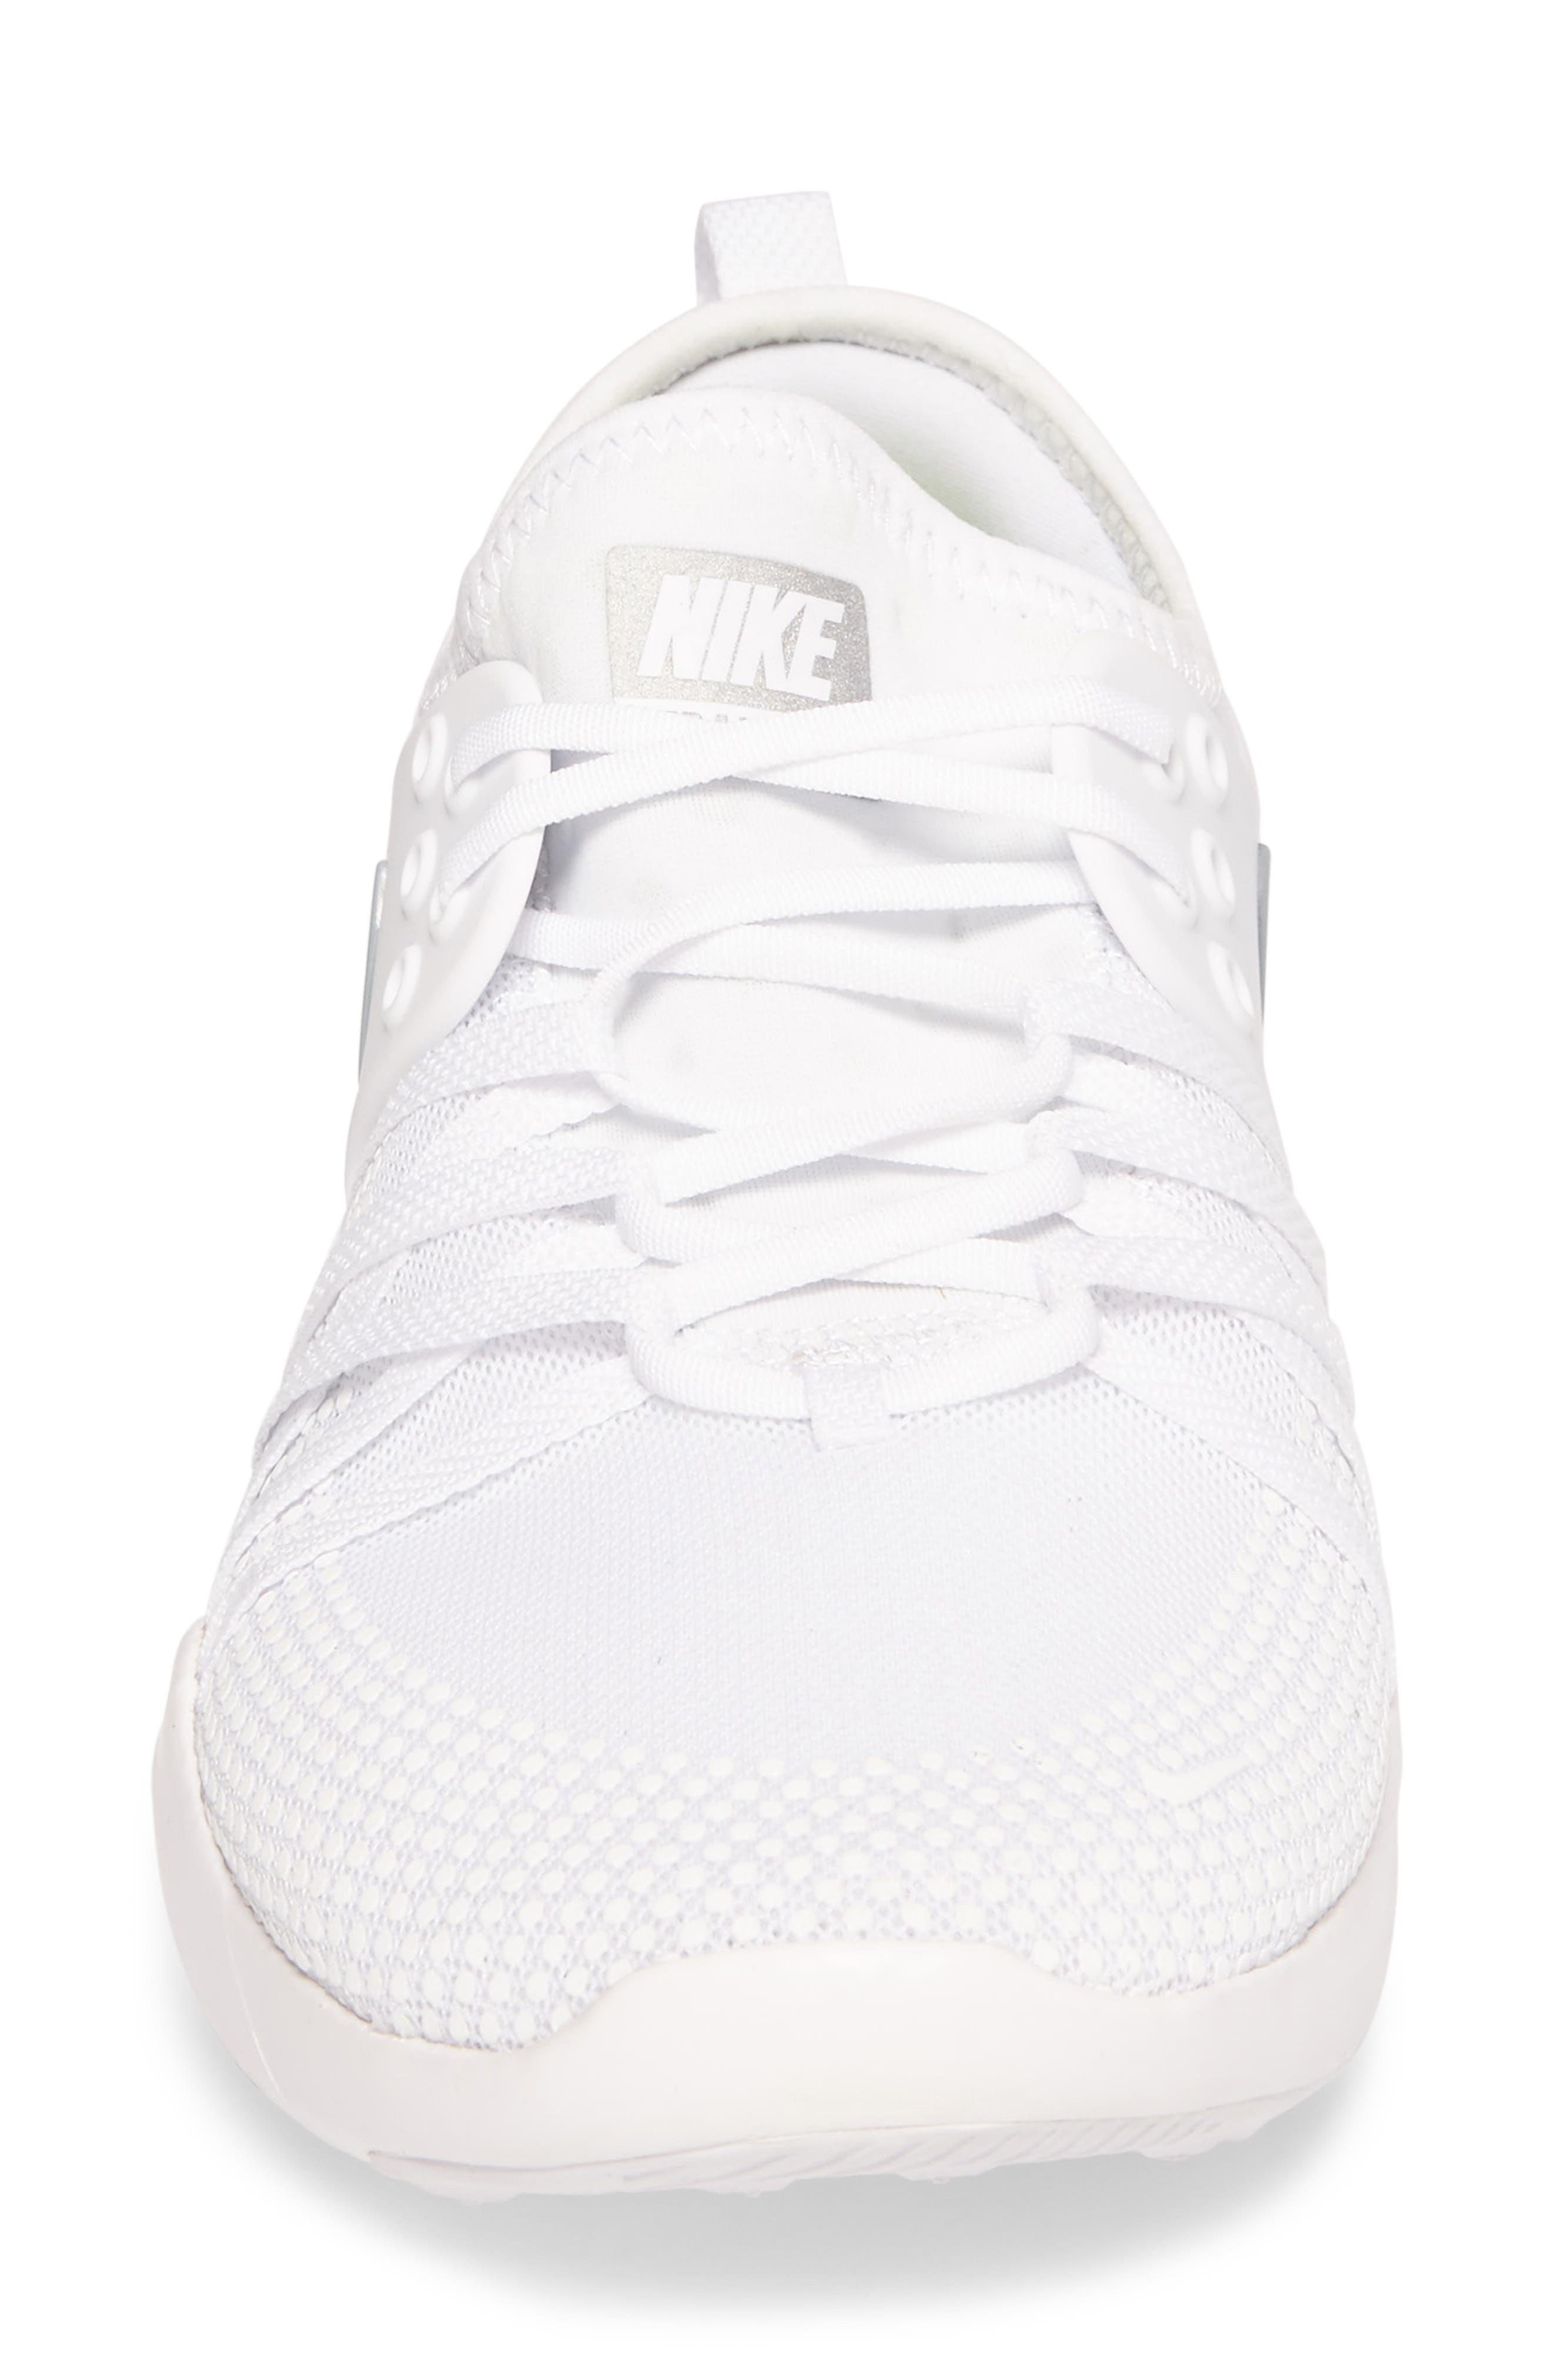 Free TR 7 Training Shoe,                             Alternate thumbnail 4, color,                             White/ Metallic Silver